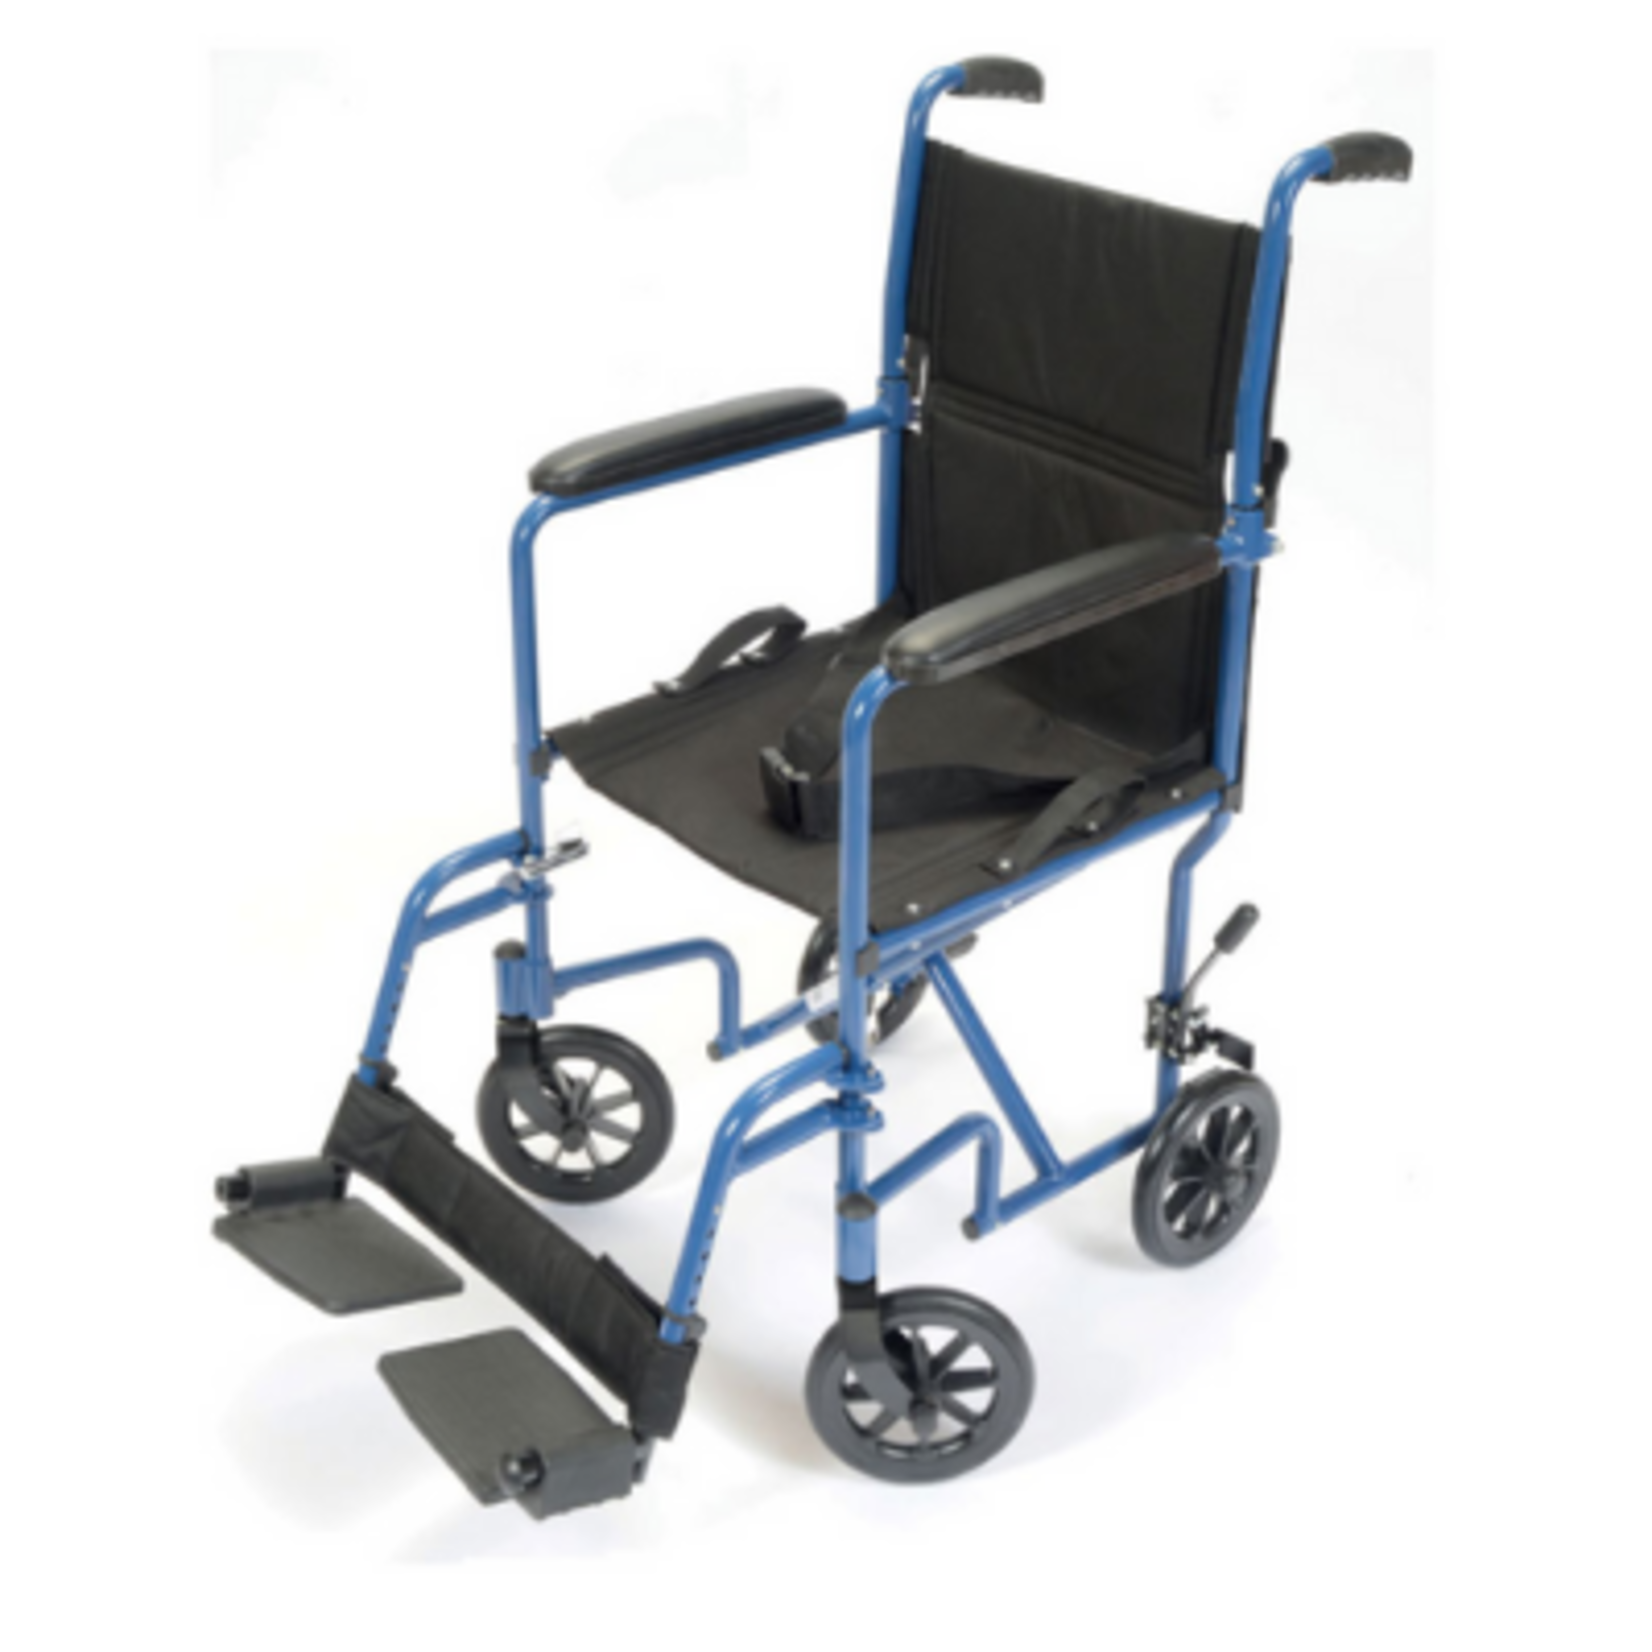 MOBB Transport Chair